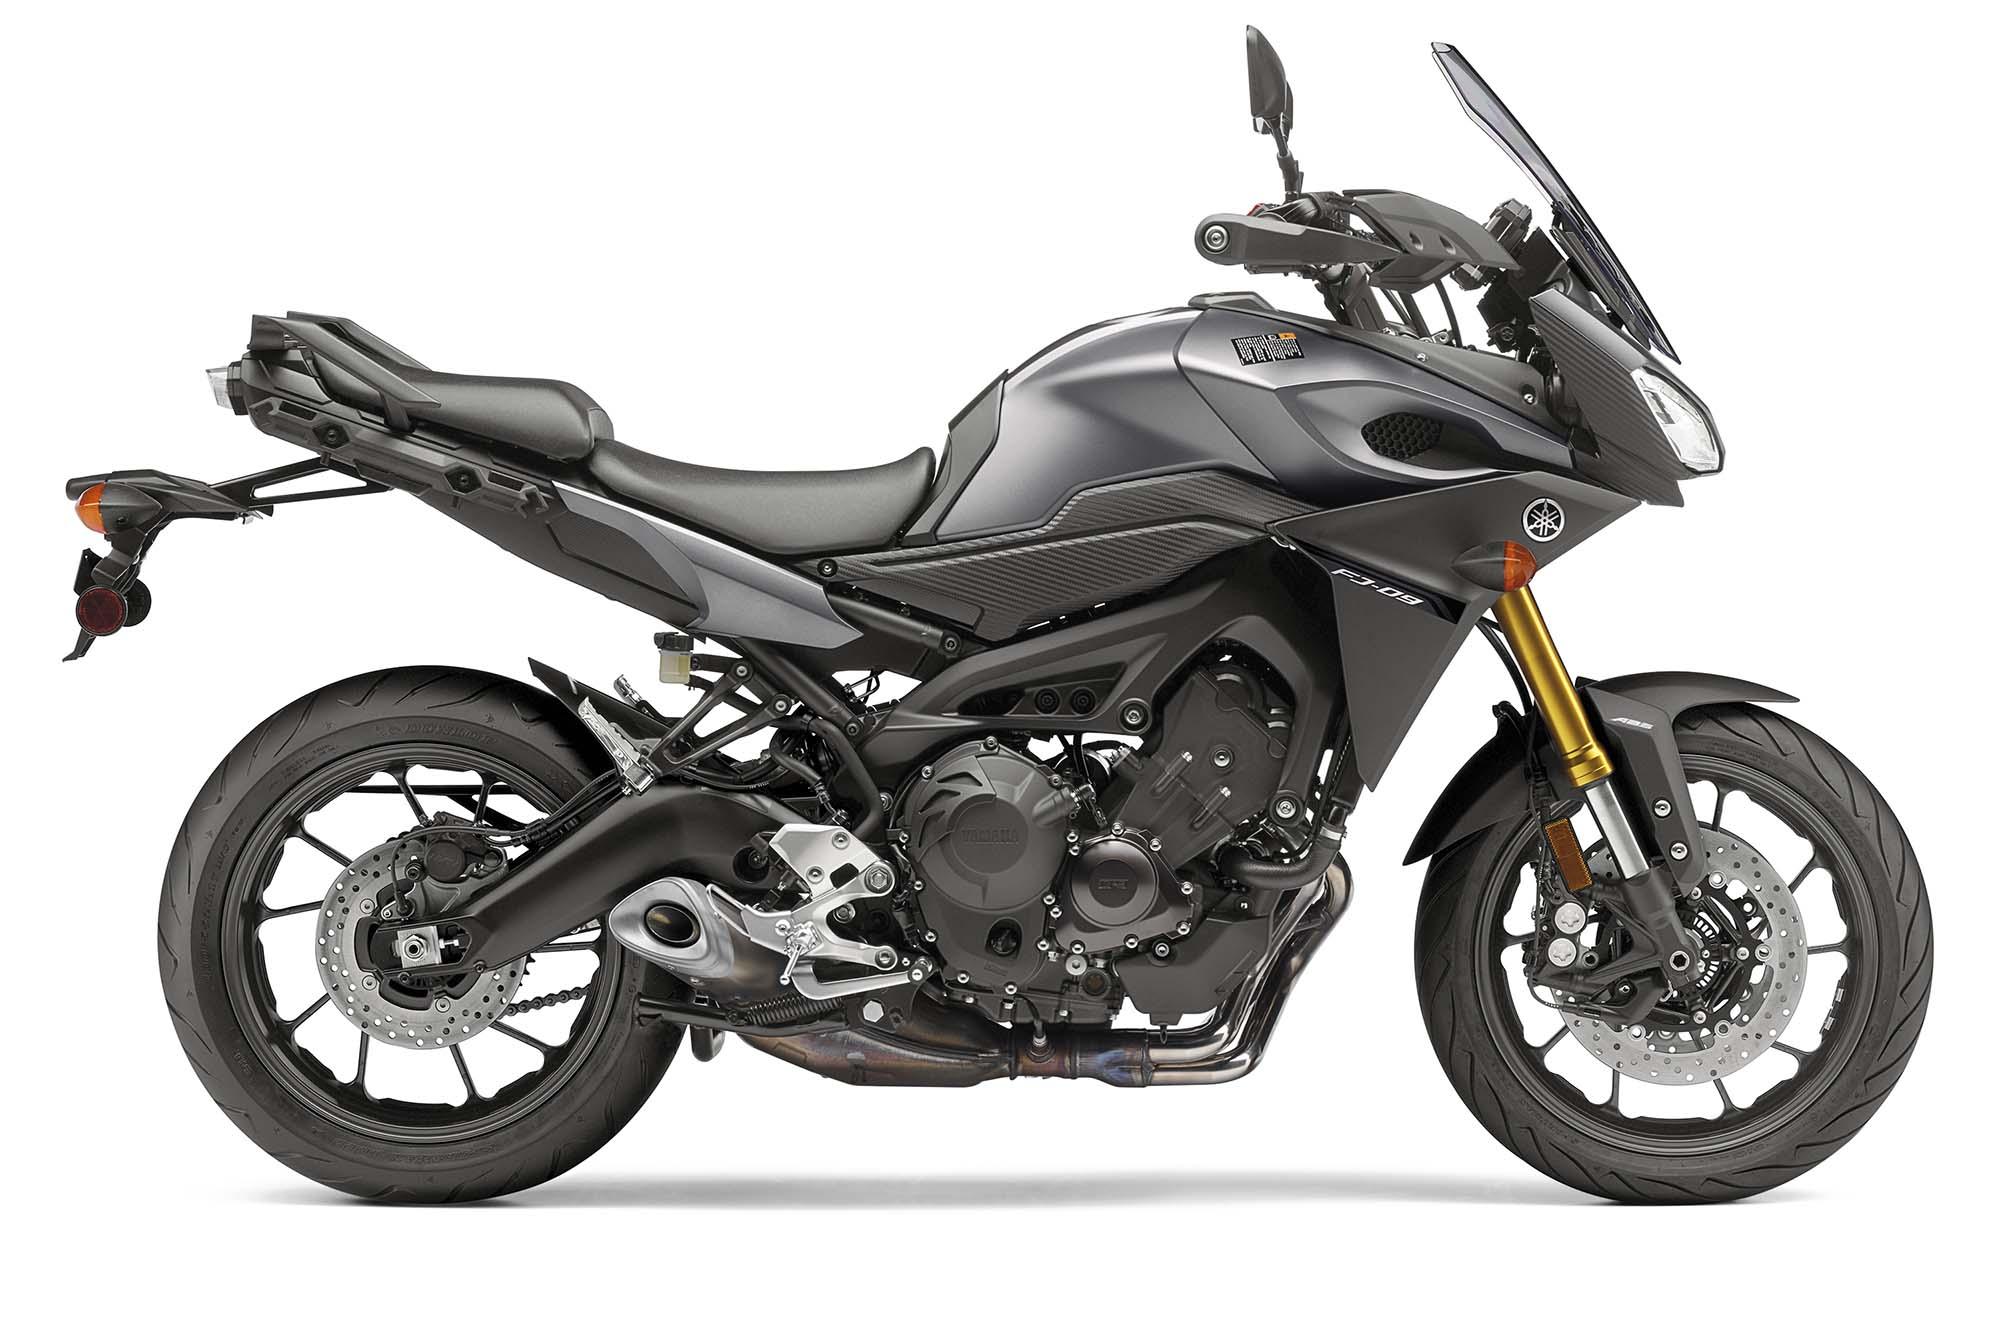 121714-2015-Yamaha-FJ-09-Beauty-9723 - Motorcycle.com